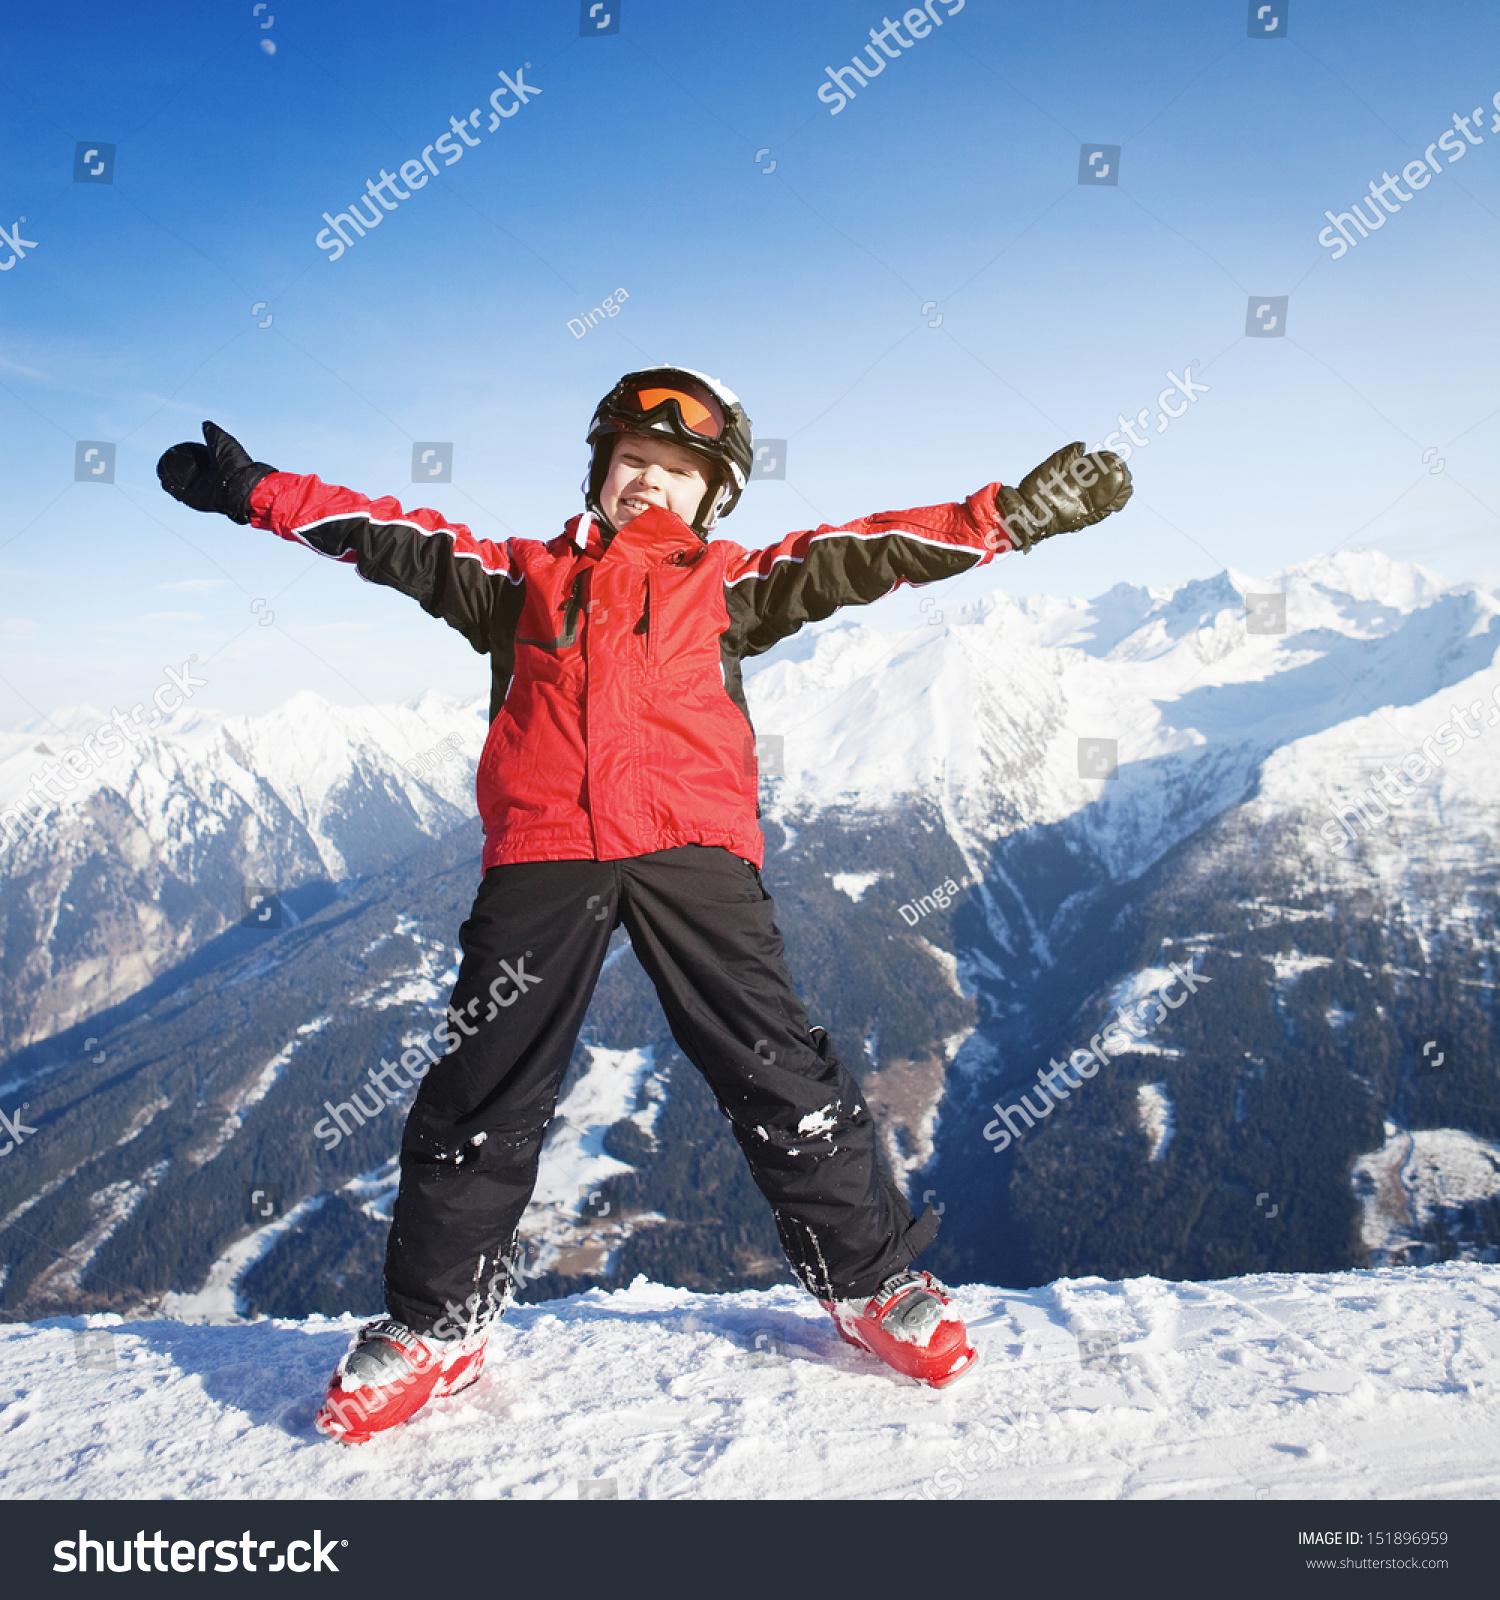 e0171c90ef5f Child Wearing Ski Clothes Having Fun Stock Photo (Edit Now ...